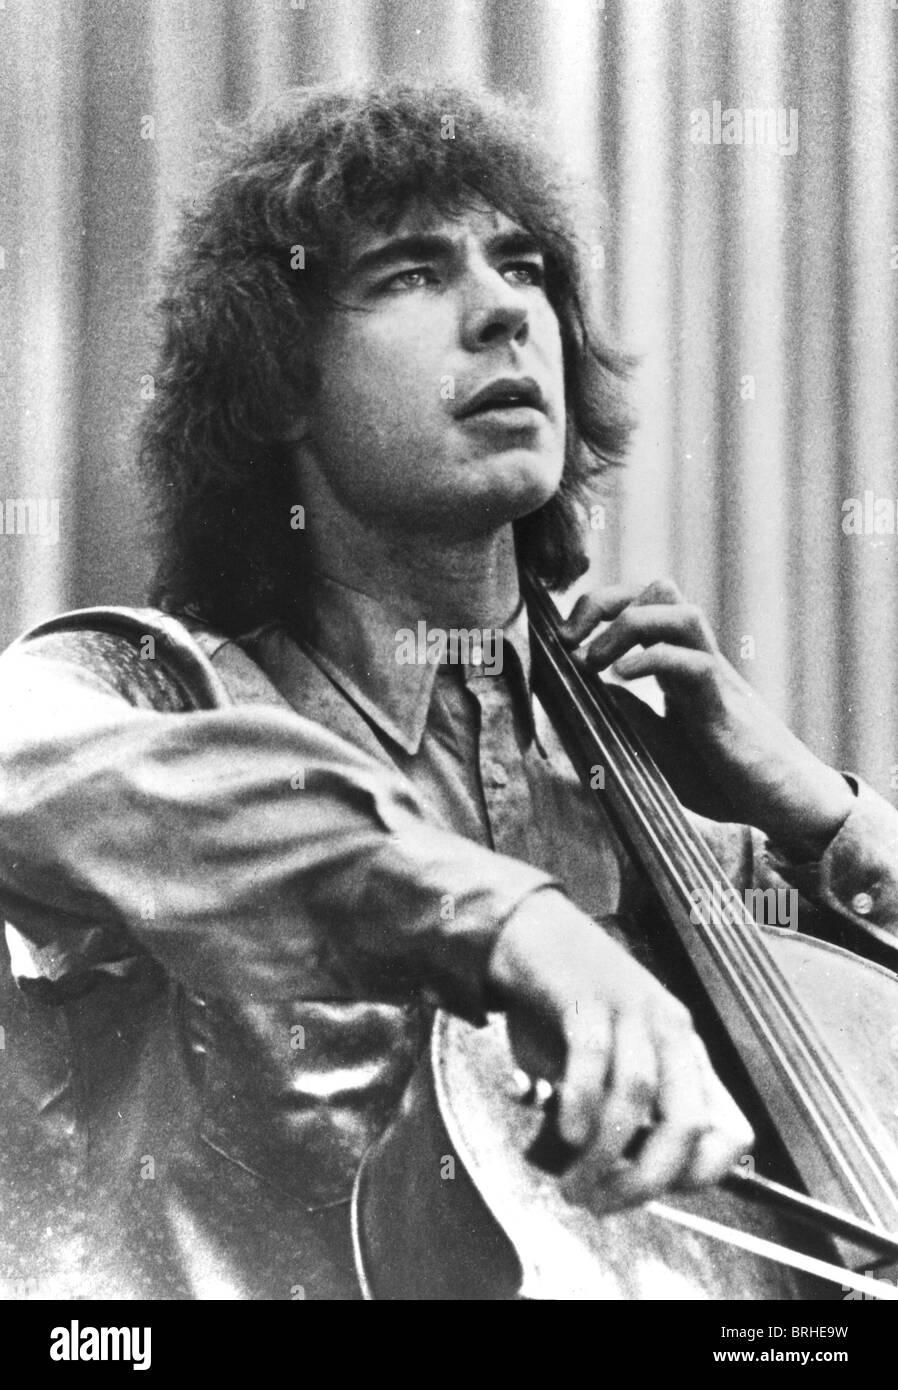 gut preiswert kaufen Rabatt-Sammlung JULIAN LLOYD WEBBER Promotional photo of UK cellist Stock ...